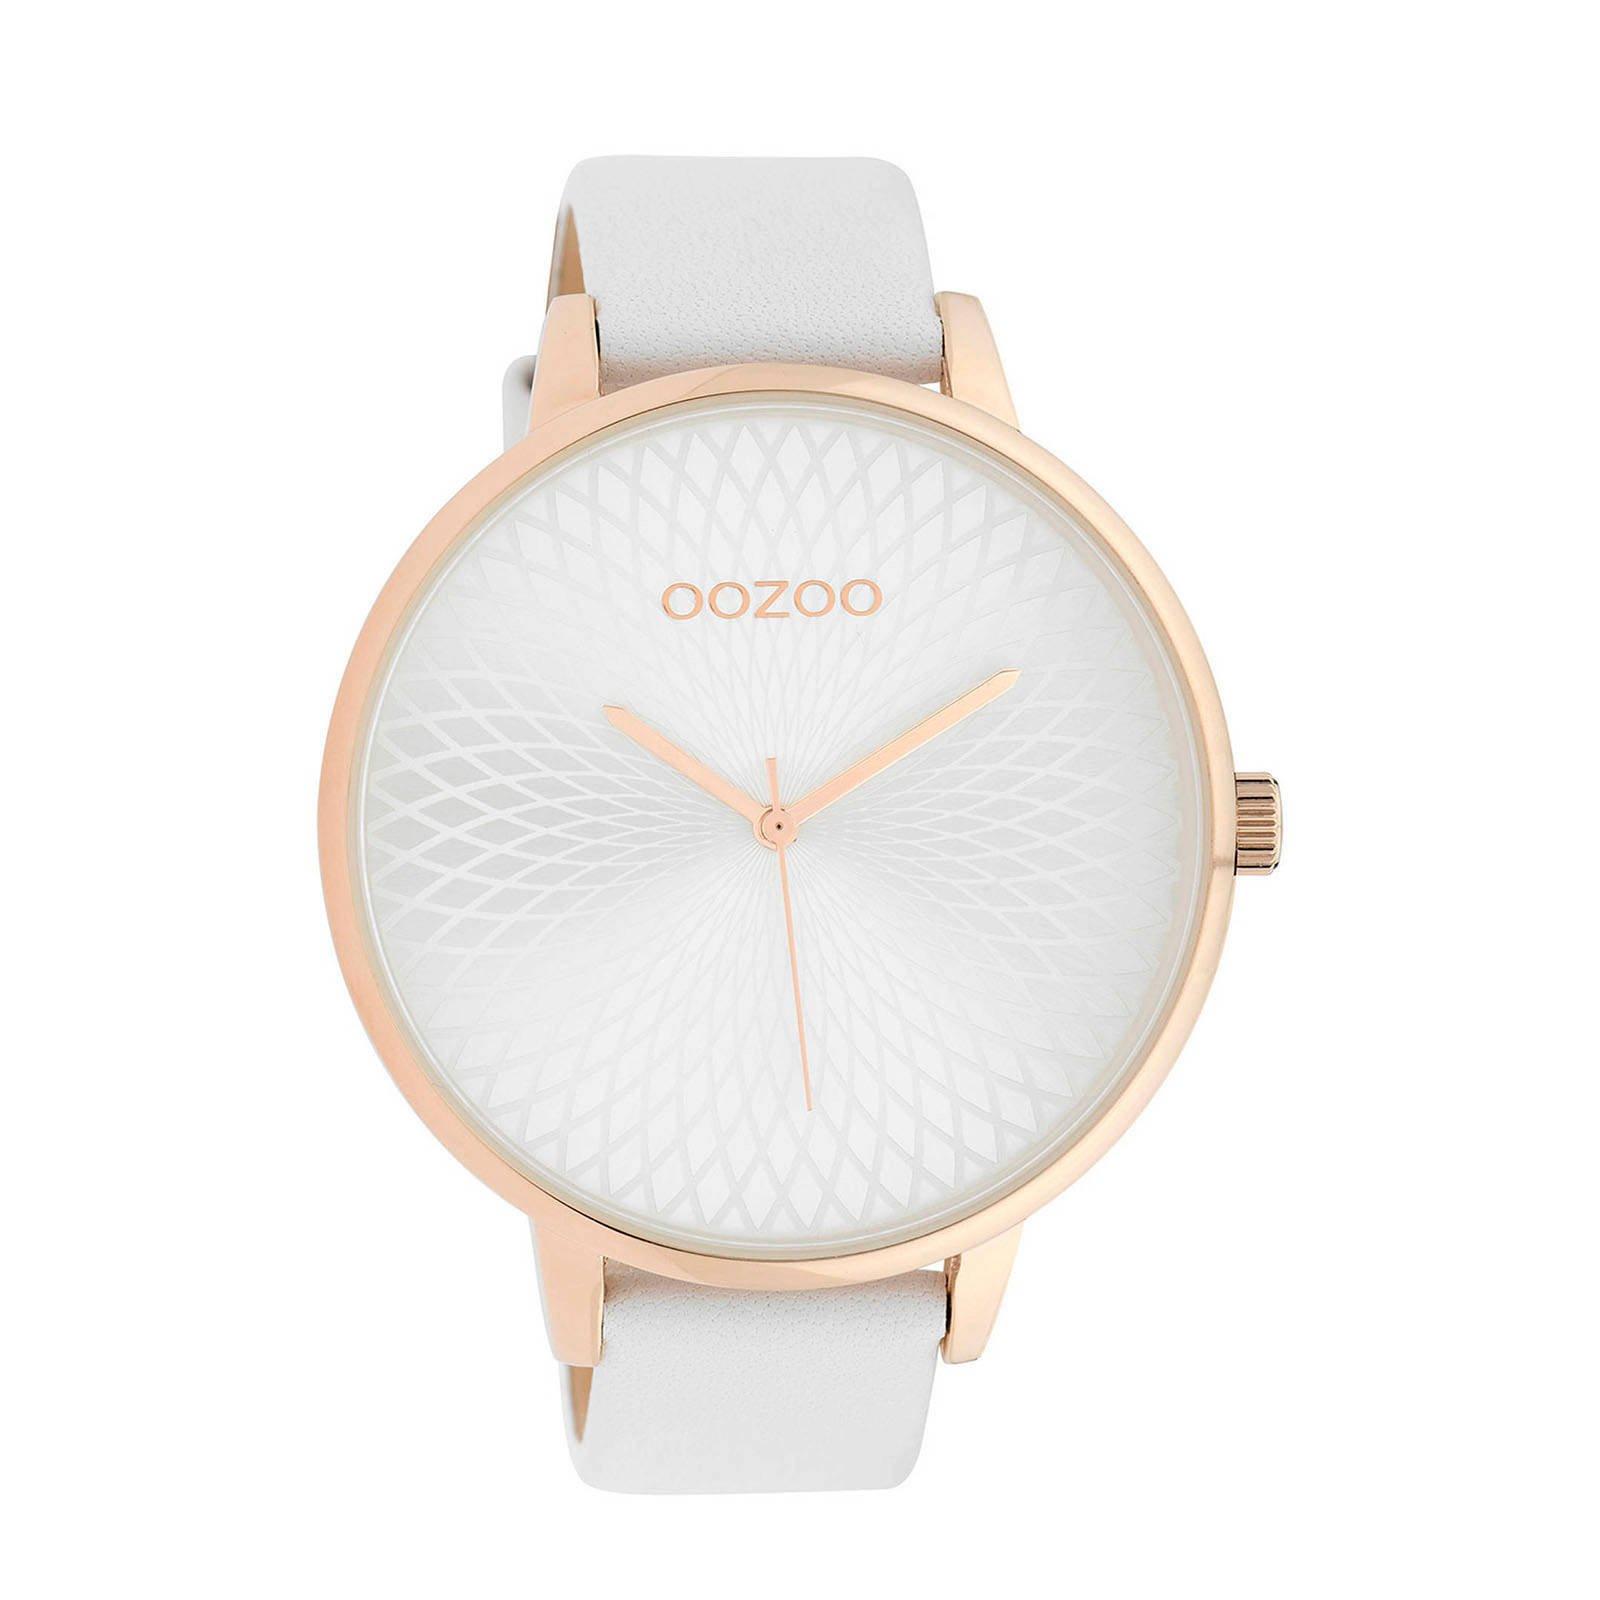 56739857b09 Oozoo Timepieces Zwart Horloge C10058 - TropicalWeather